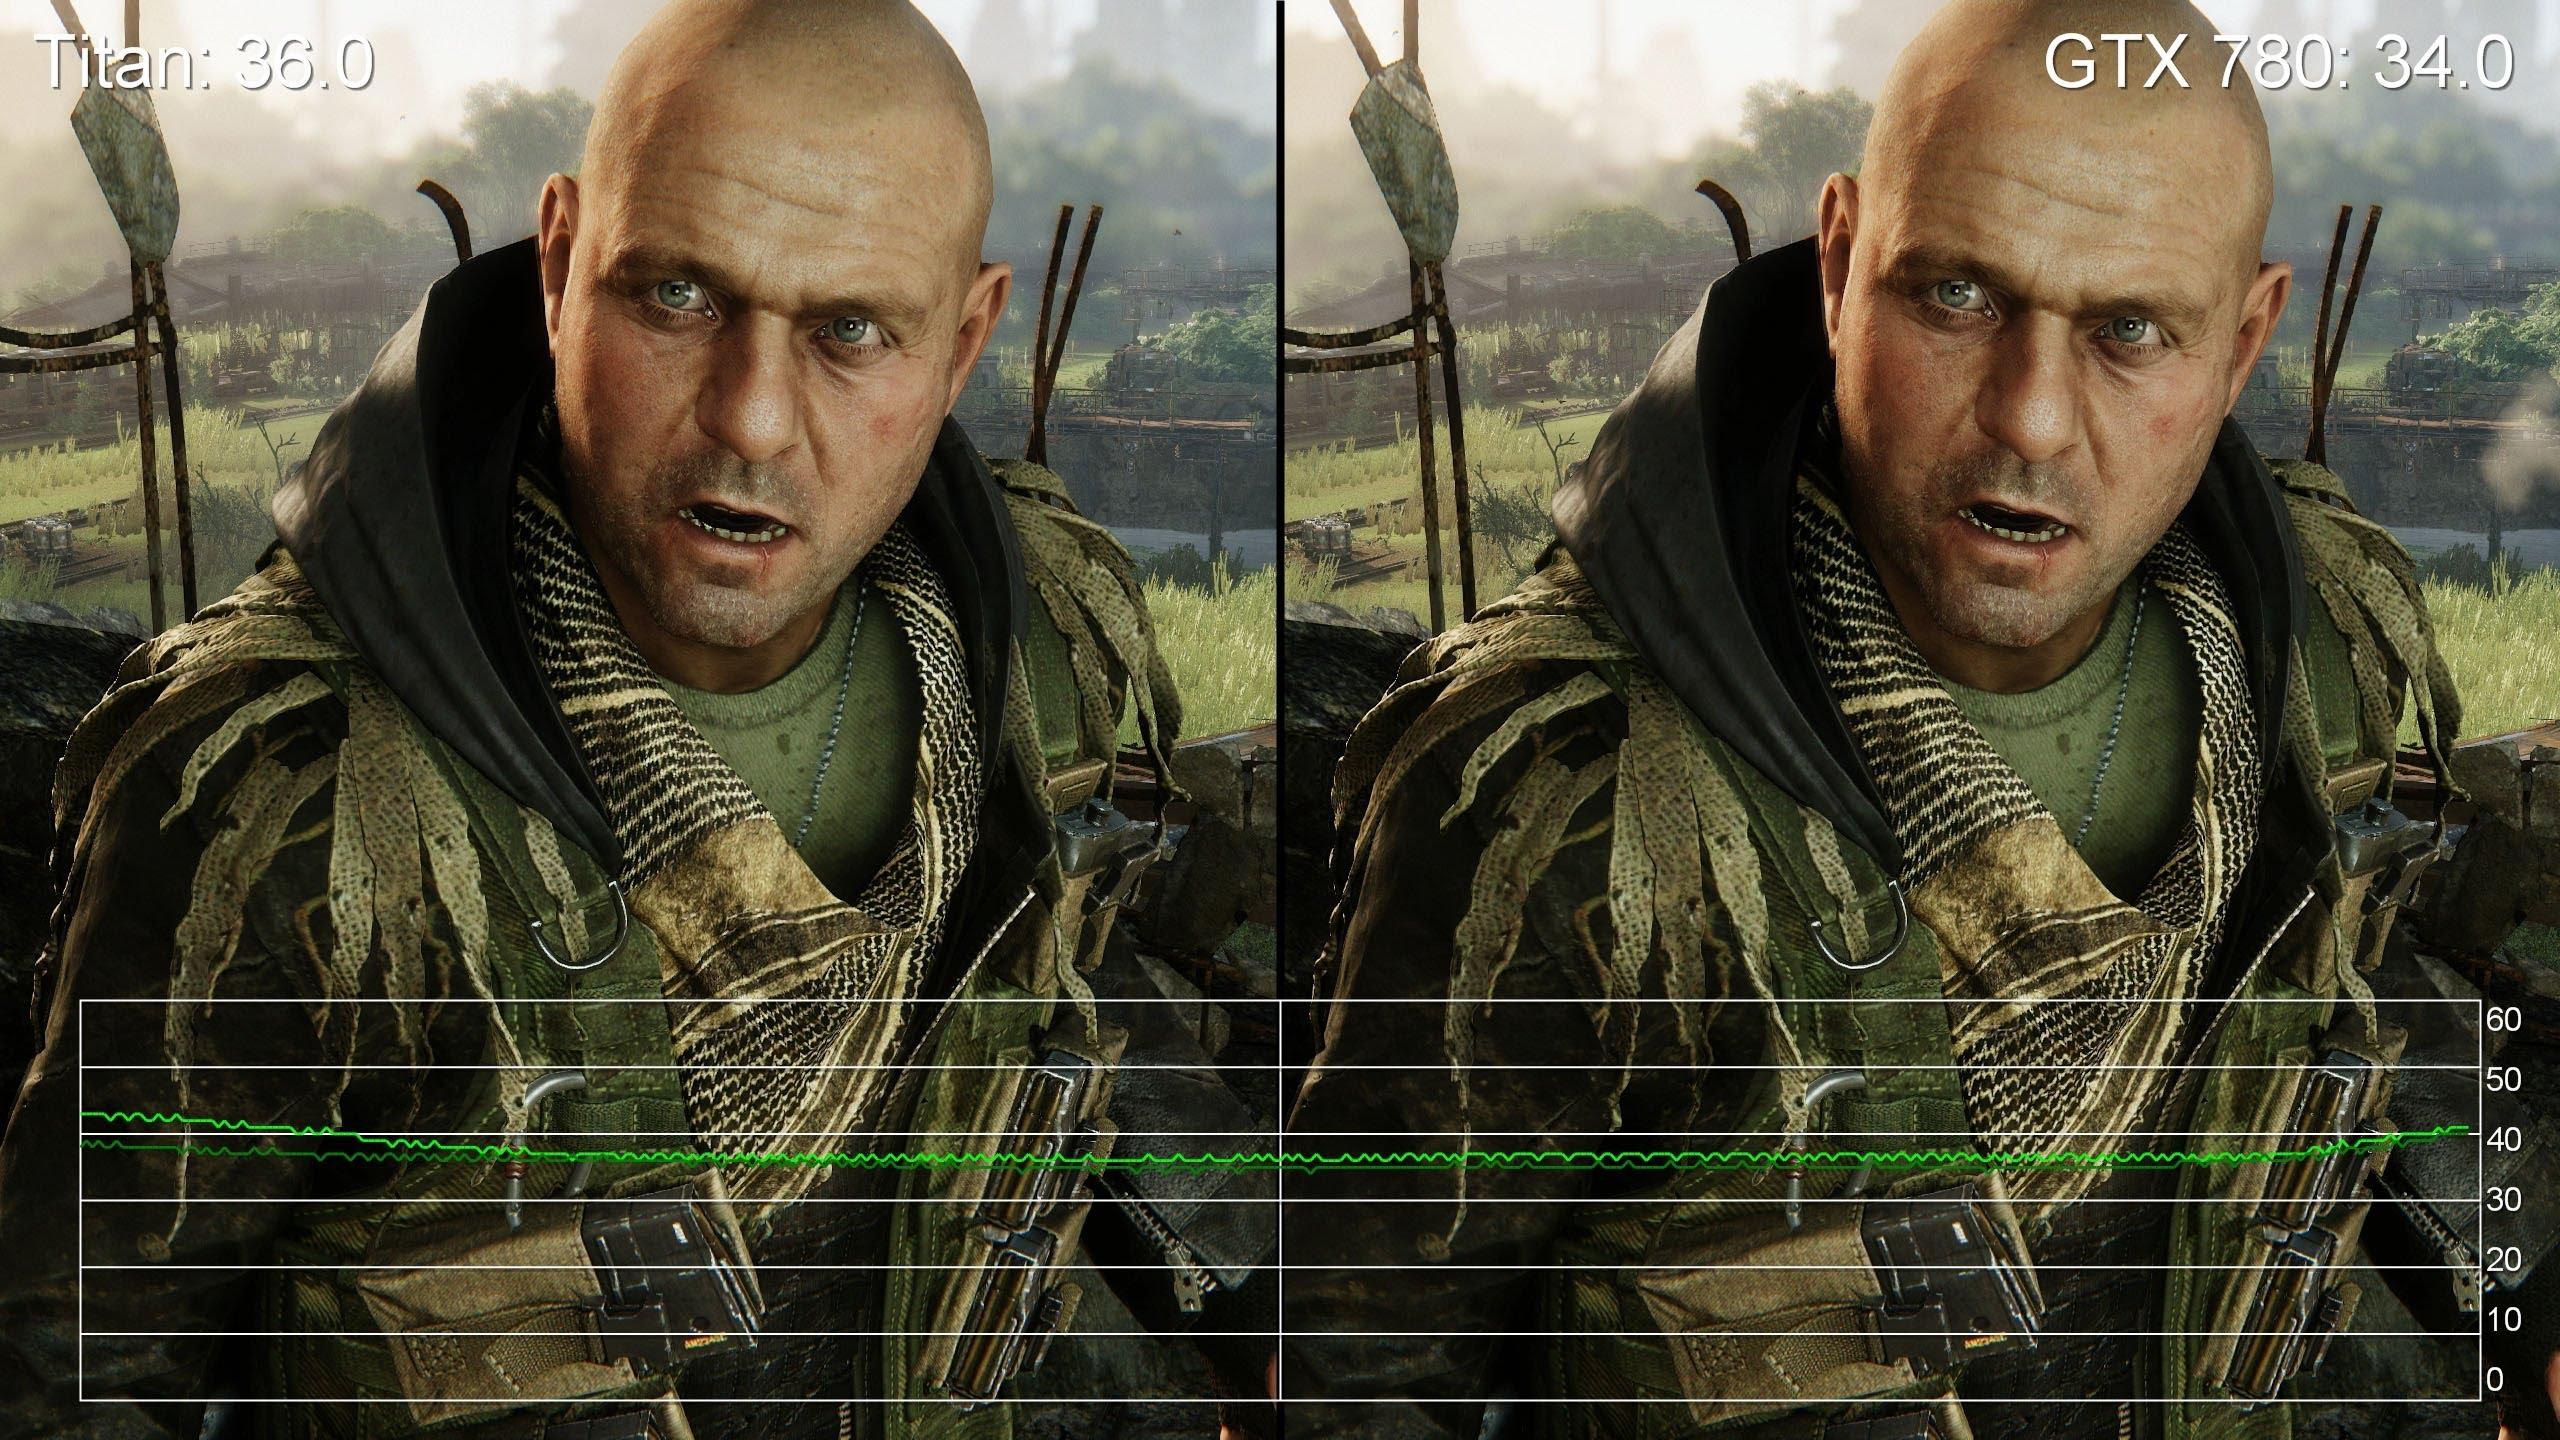 Crysis 3 GTX Titan vs GTX 780 2560x1440 Very High Settings Frame 2560x1440